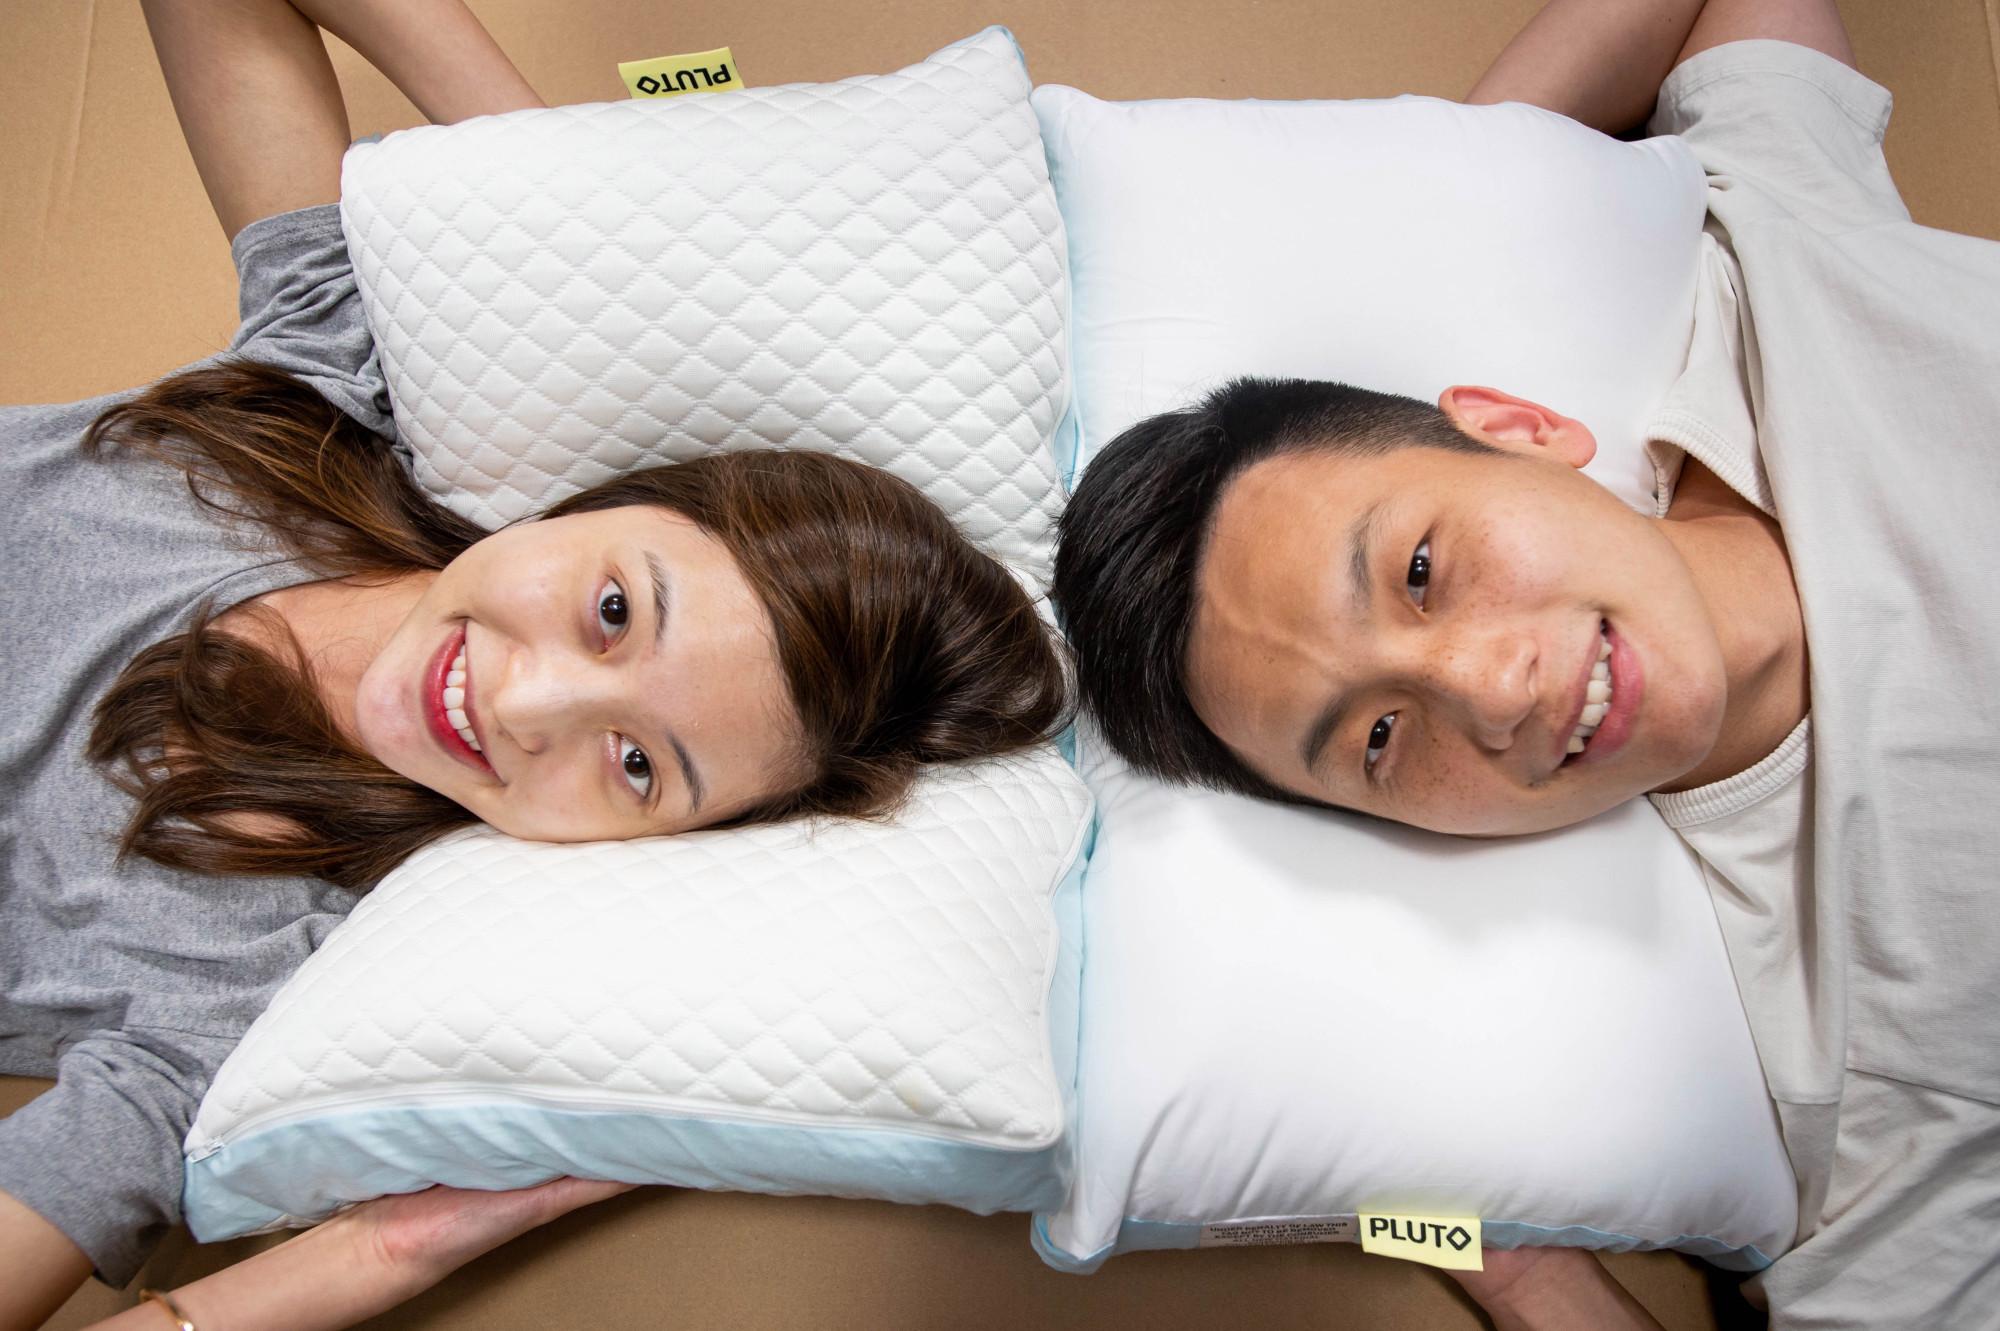 https www sgvtribune com 2021 05 12 city of industry businessfolk jump into shark tank do custom pillows assure soft landing